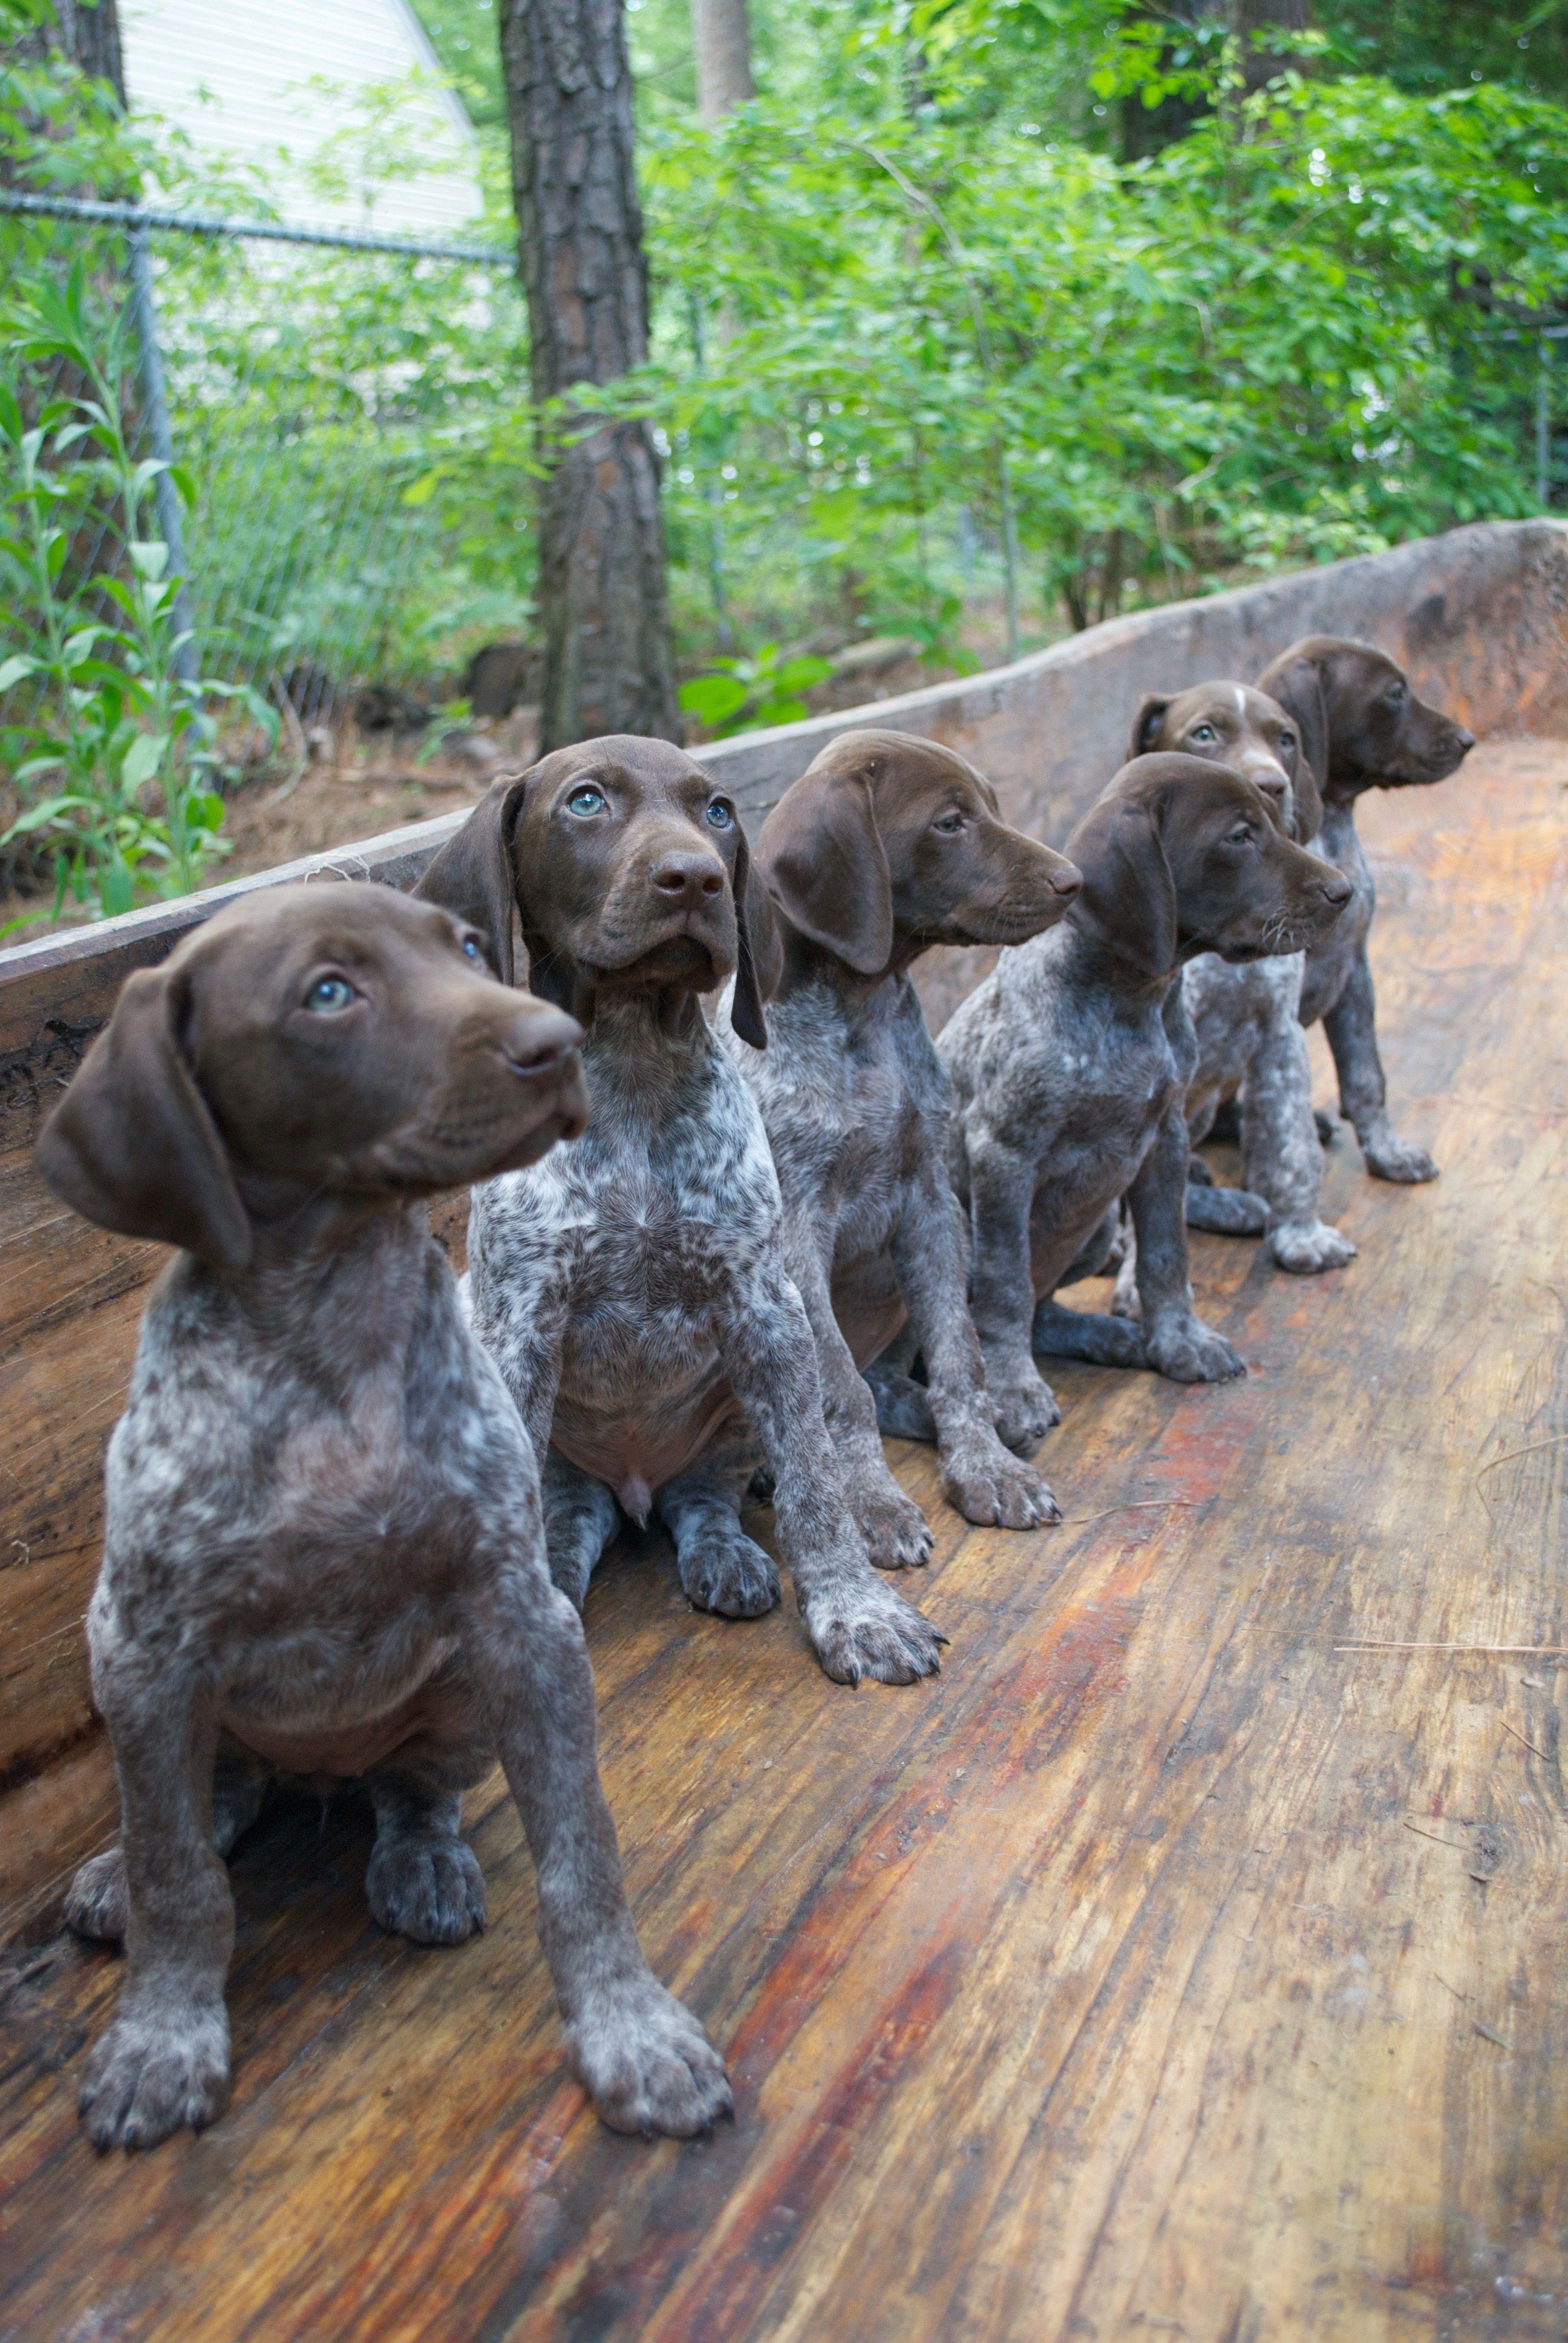 #gsp #puppy #7weeksold #gspownerforlife #germanshorthairedpointer #germanshorthairedpointerpuppy #germanshorthairedpointerpuppies